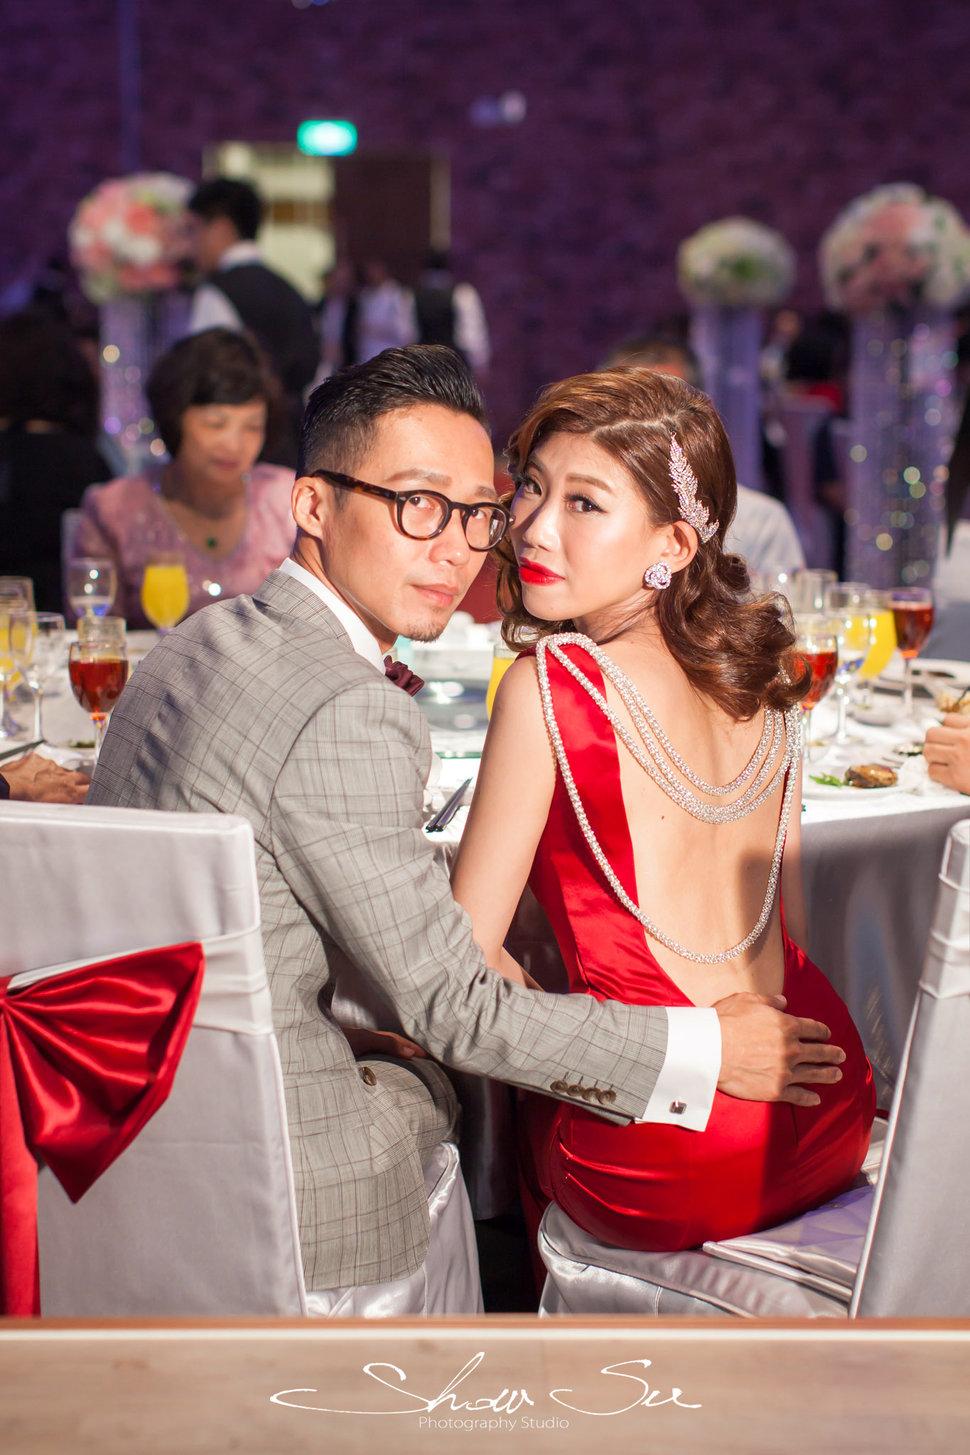 (編號:550275) - Show Su Photography - 結婚吧一站式婚禮服務平台